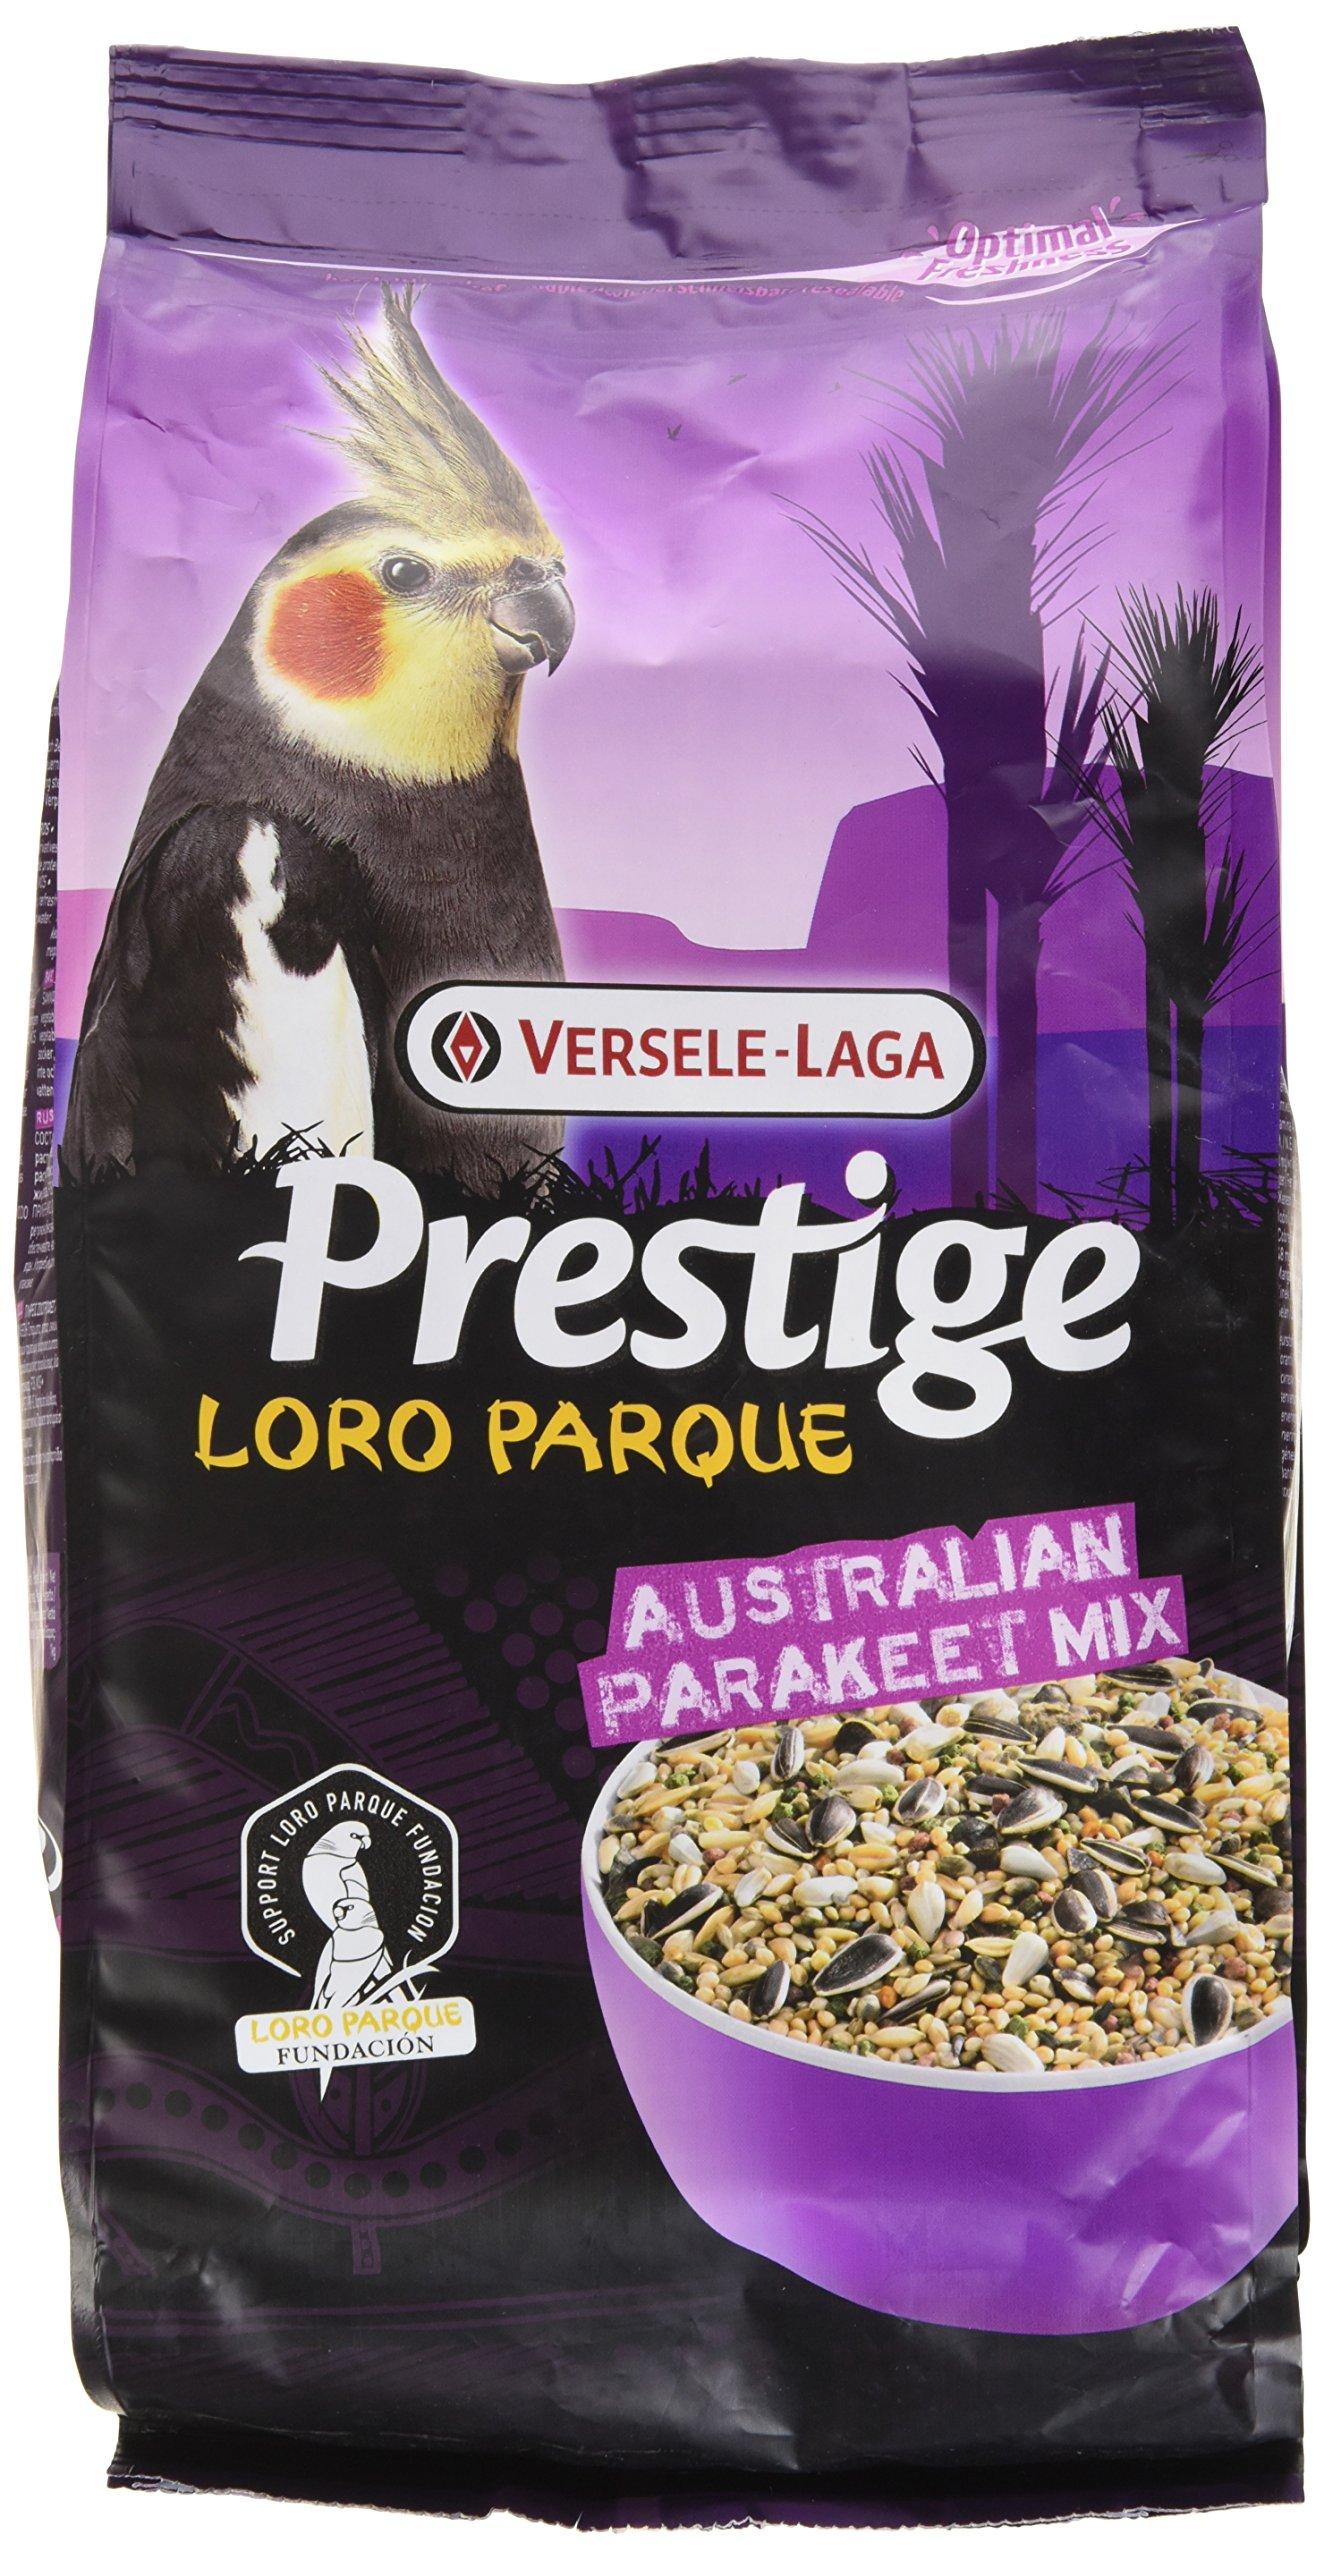 Prestige Premium Parakeet Loro Parque Mix Bird Food 1 kilogram